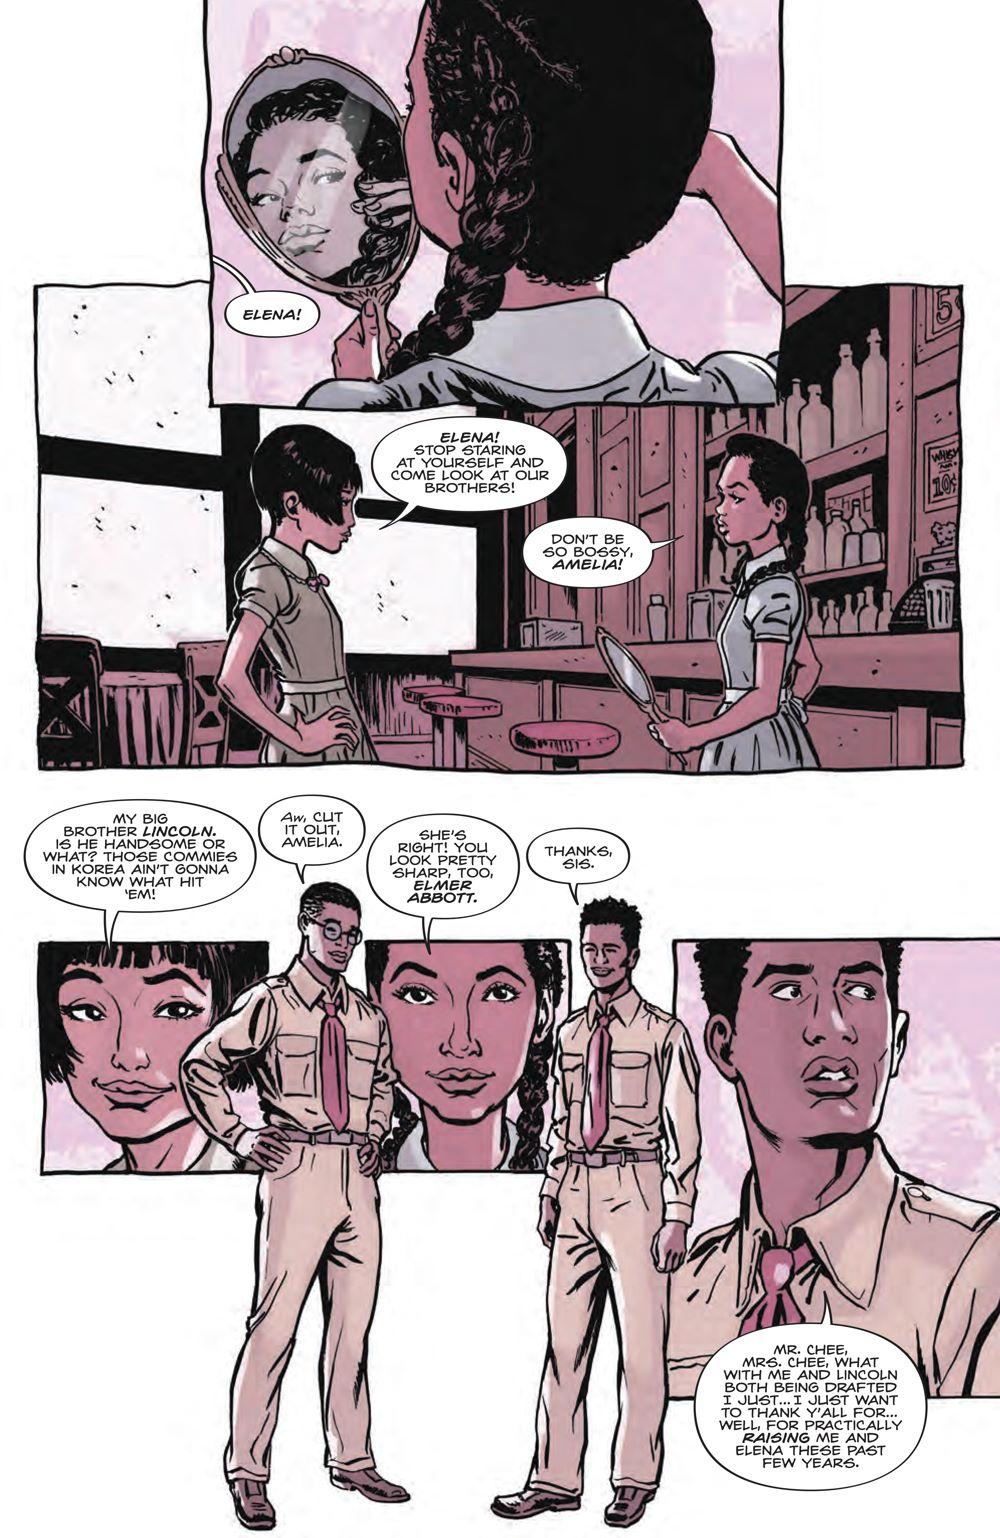 Abbott_1973_003_PRESS_8 ComicList Previews: ABBOTT 1973 #3 (OF 5)